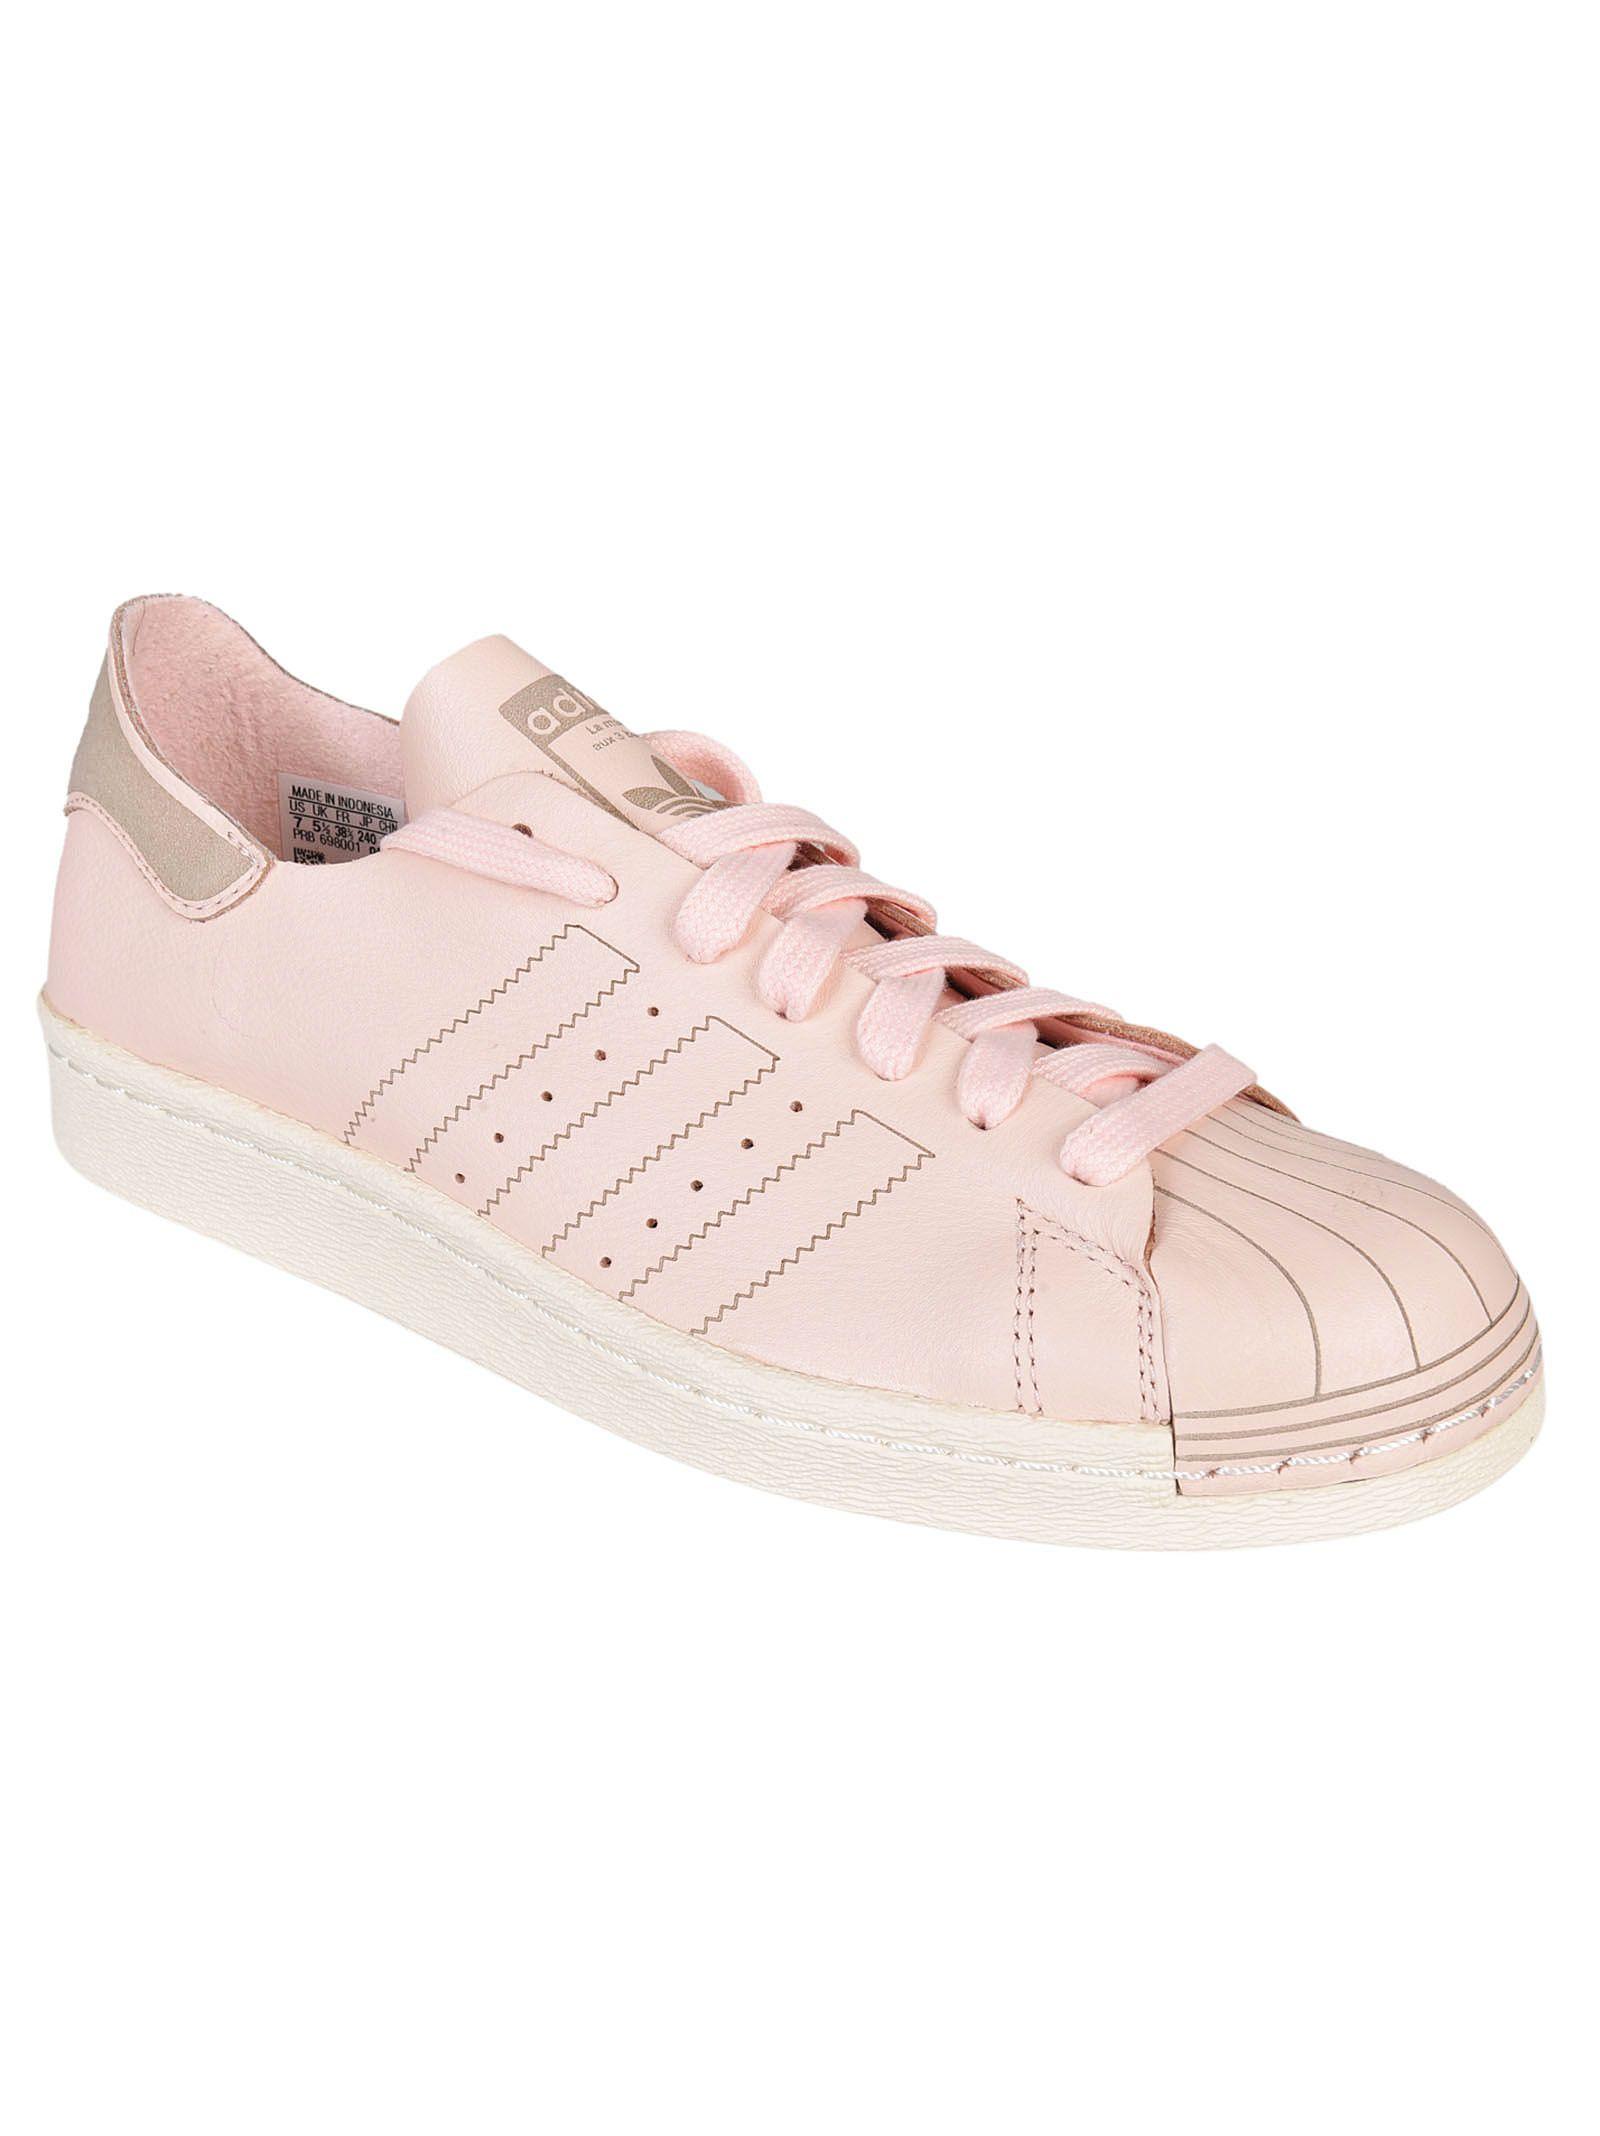 bfded48e36e2 Adidas Adidas Superstar 80 s Deacon Sneakers - Pink - 8916660